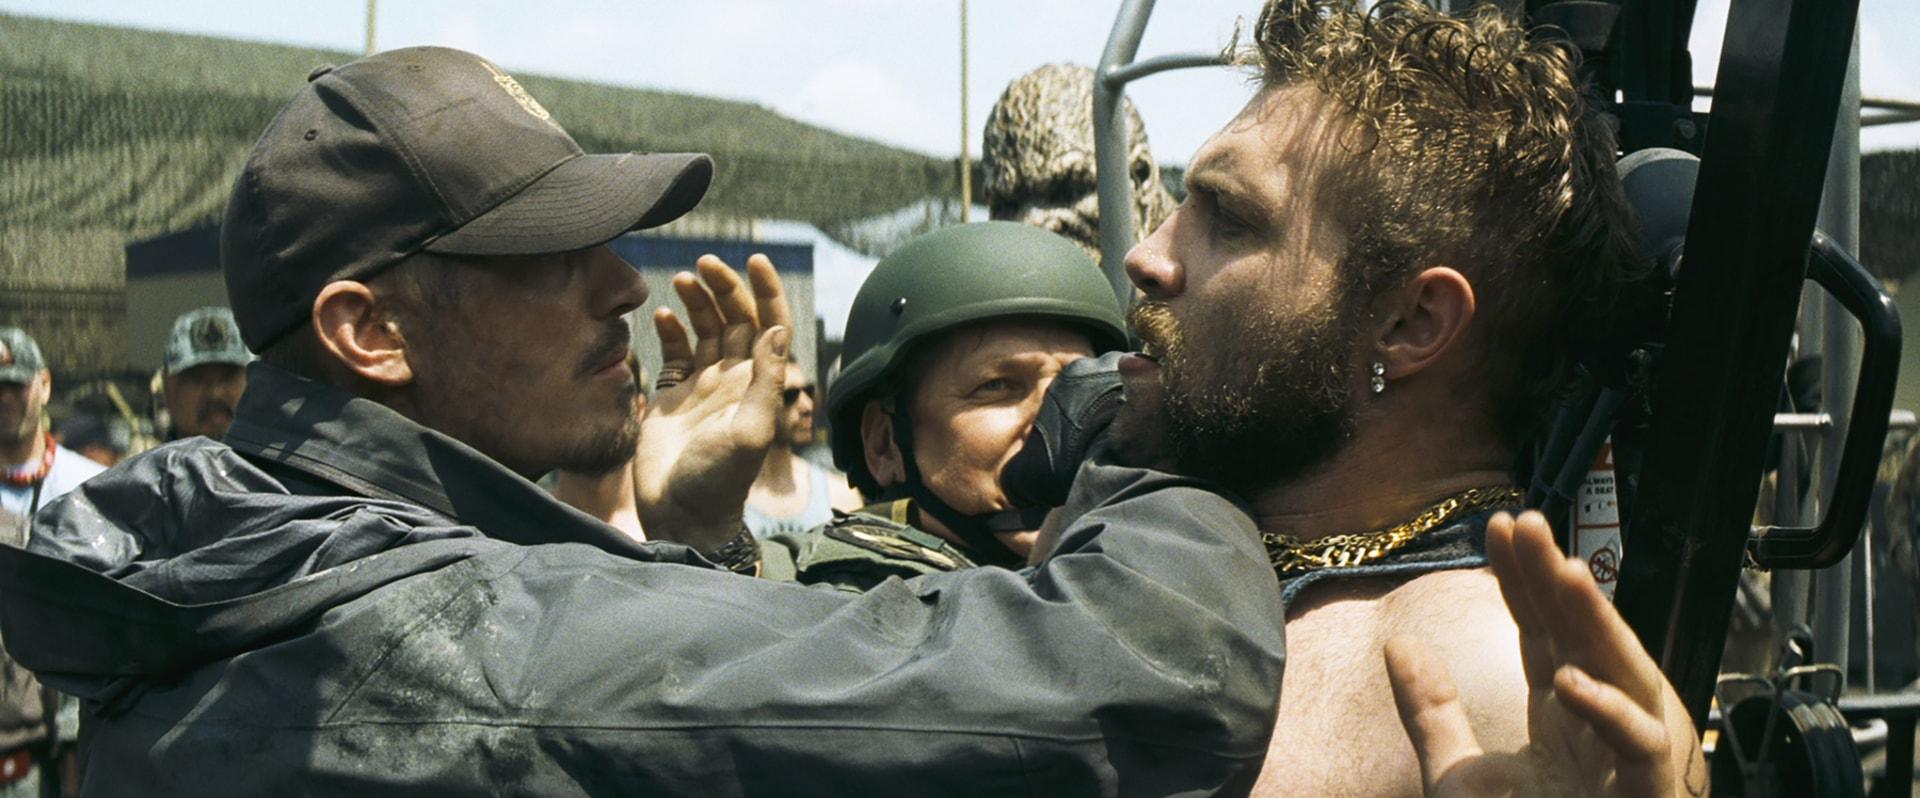 JOEL KINNAMAN as Rick Flag and JAI COURTNEY as Boomerang